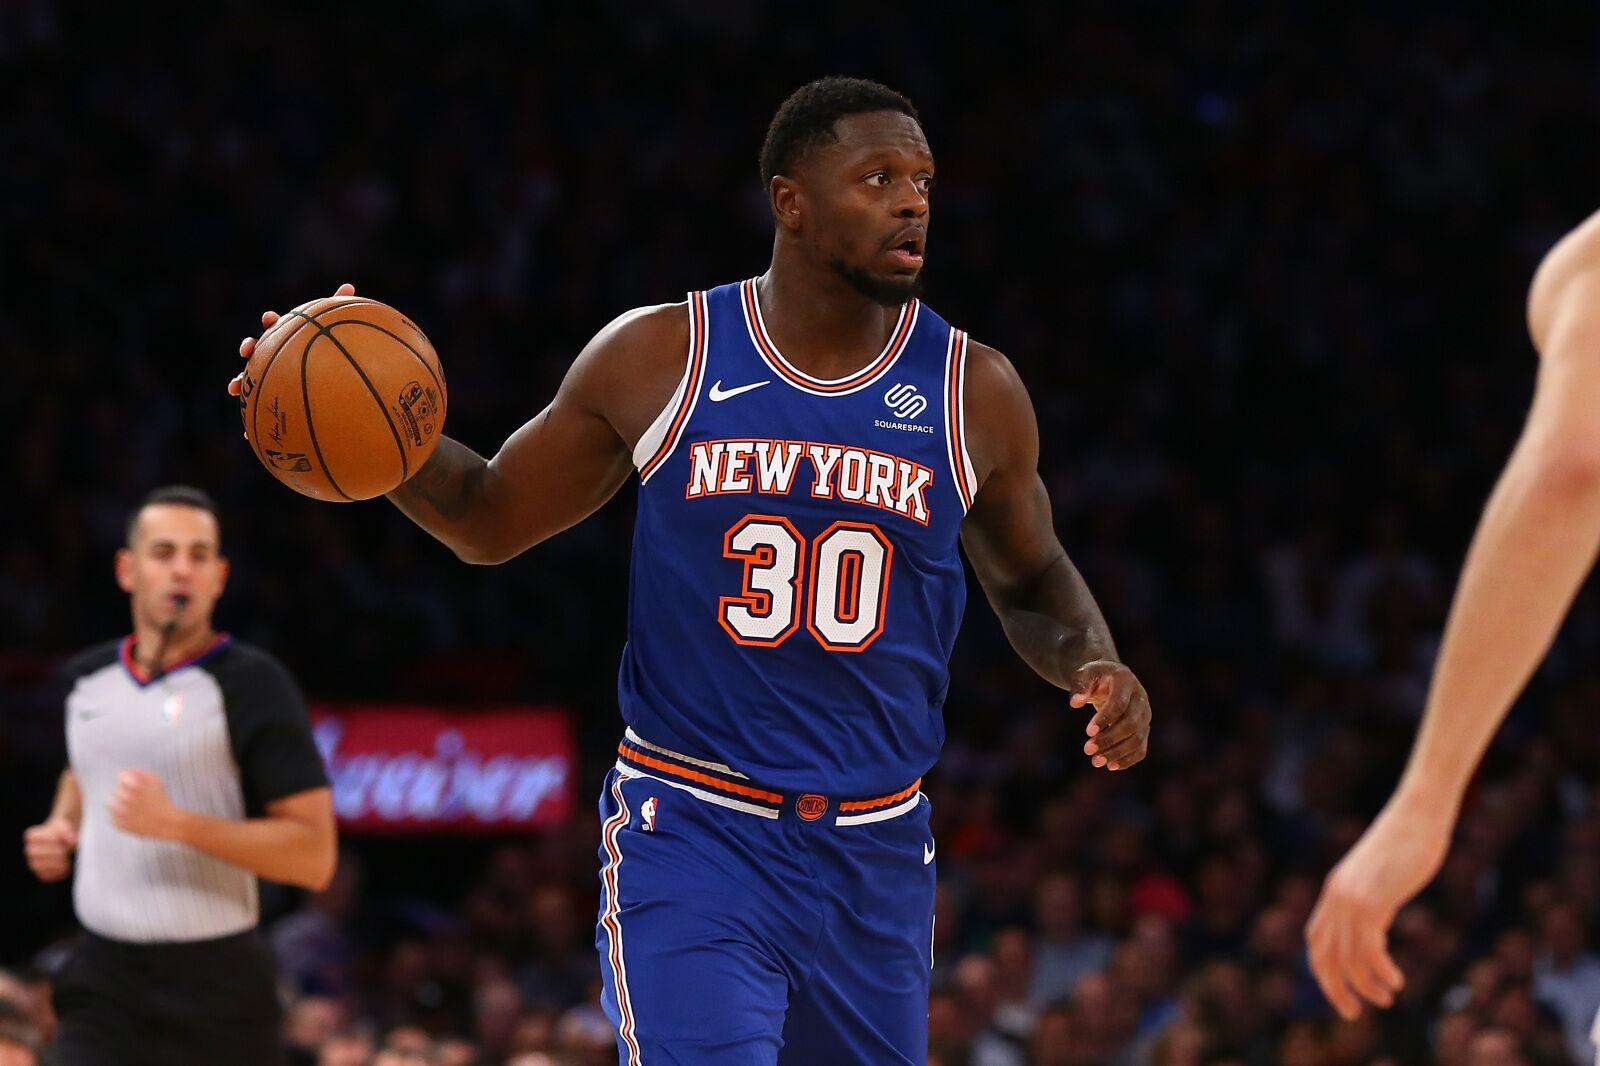 New York Knicks: Assessing Julius Randle's early struggles